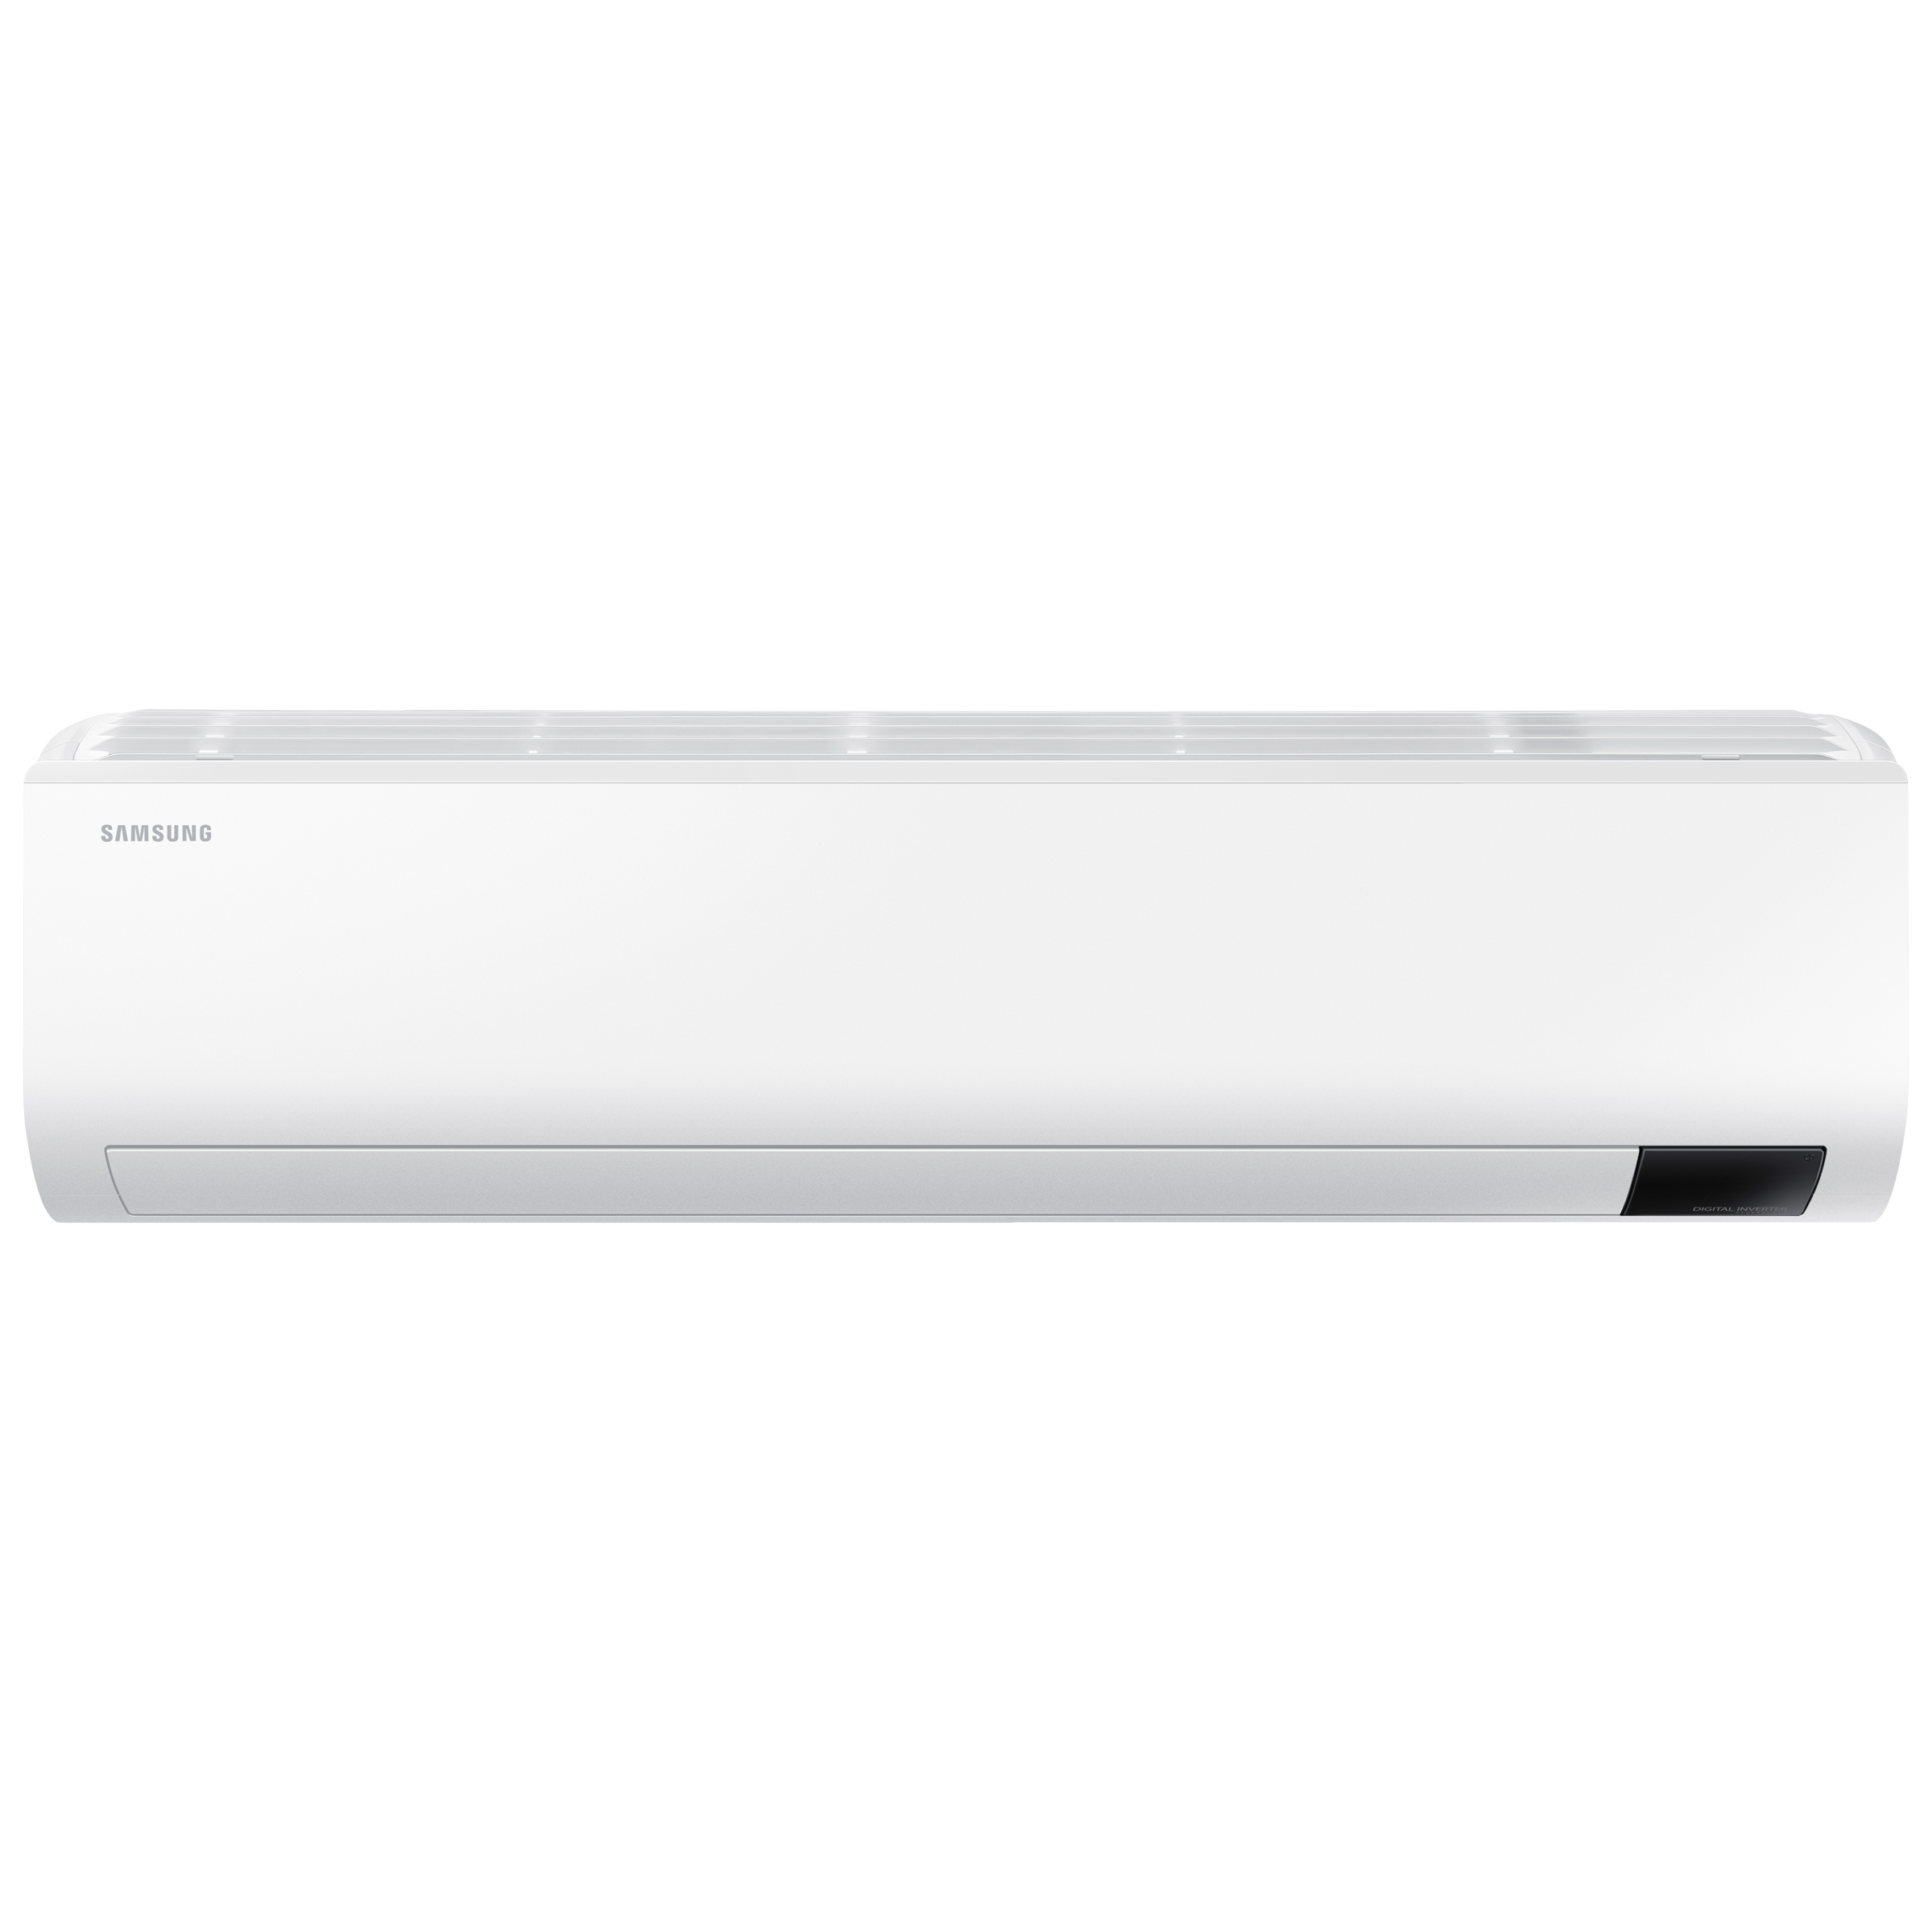 Samsung 1.5 Ton 5 Star Inverter Split AC (Convertible AC, Copper Condenser, AR18AY5ZBWK, White)_1